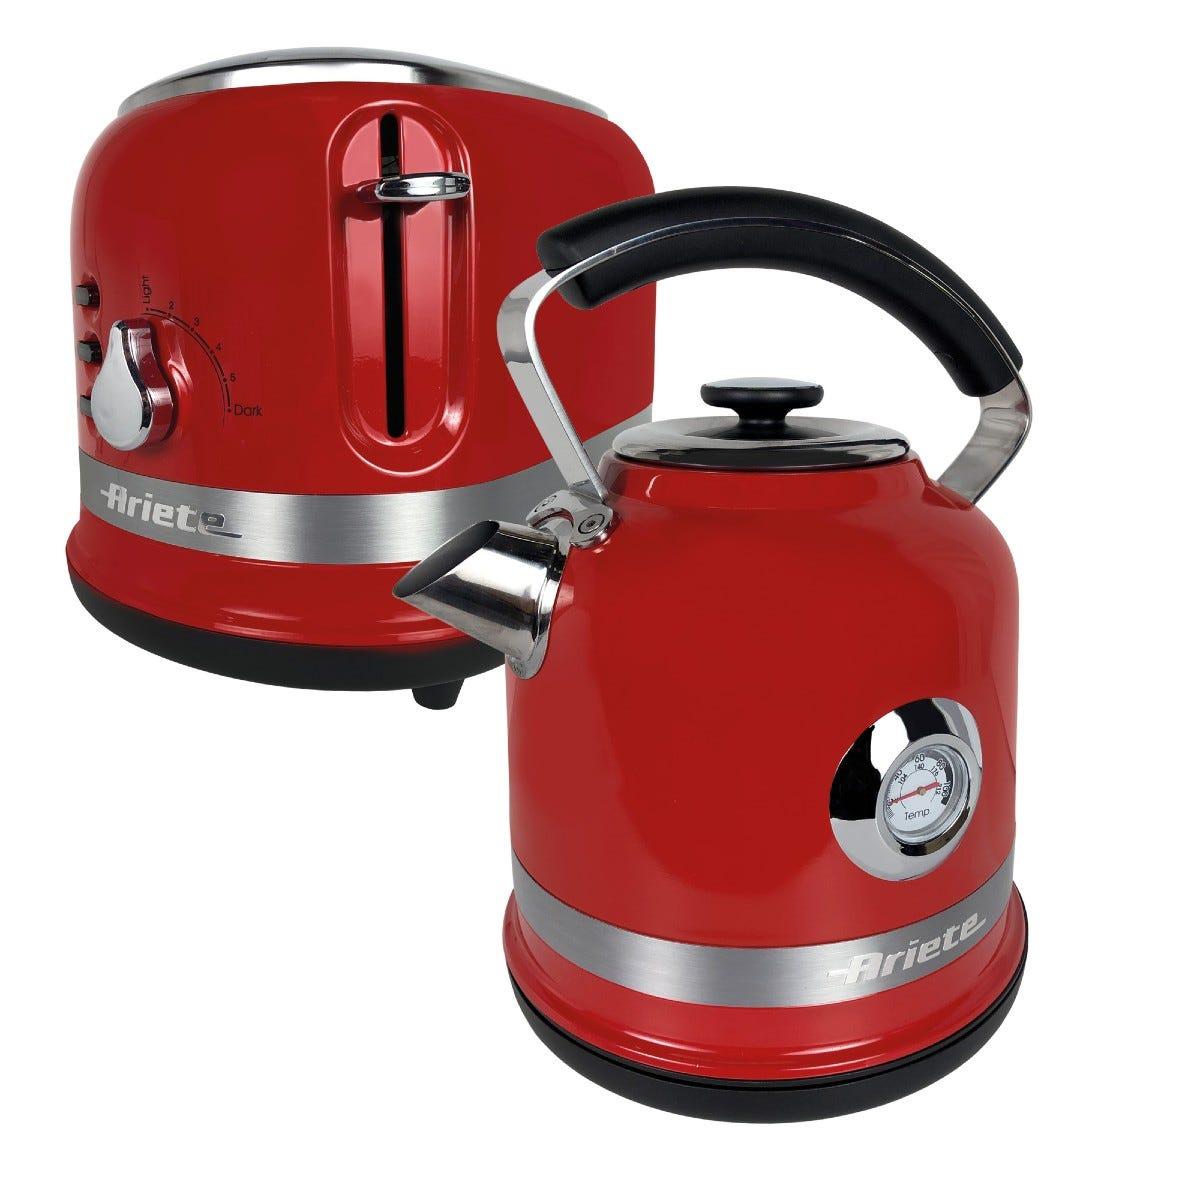 Ariette ARPK30 Moderna 1.7L Kettle and 2-Slice Toaster - Red